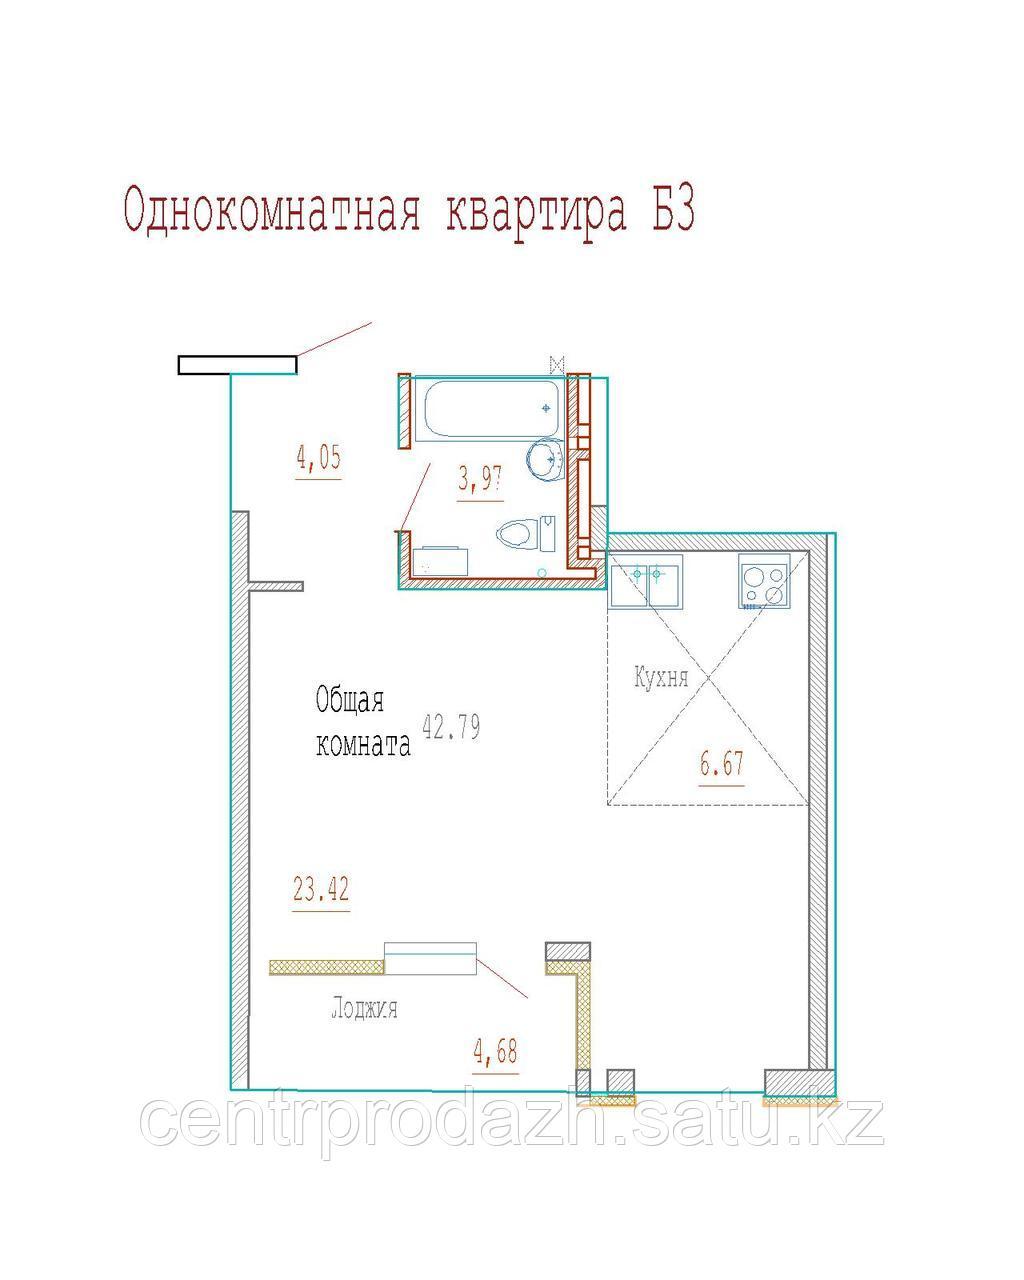 1 комнатная квартира в ЖК Кристалл 2 42 м²